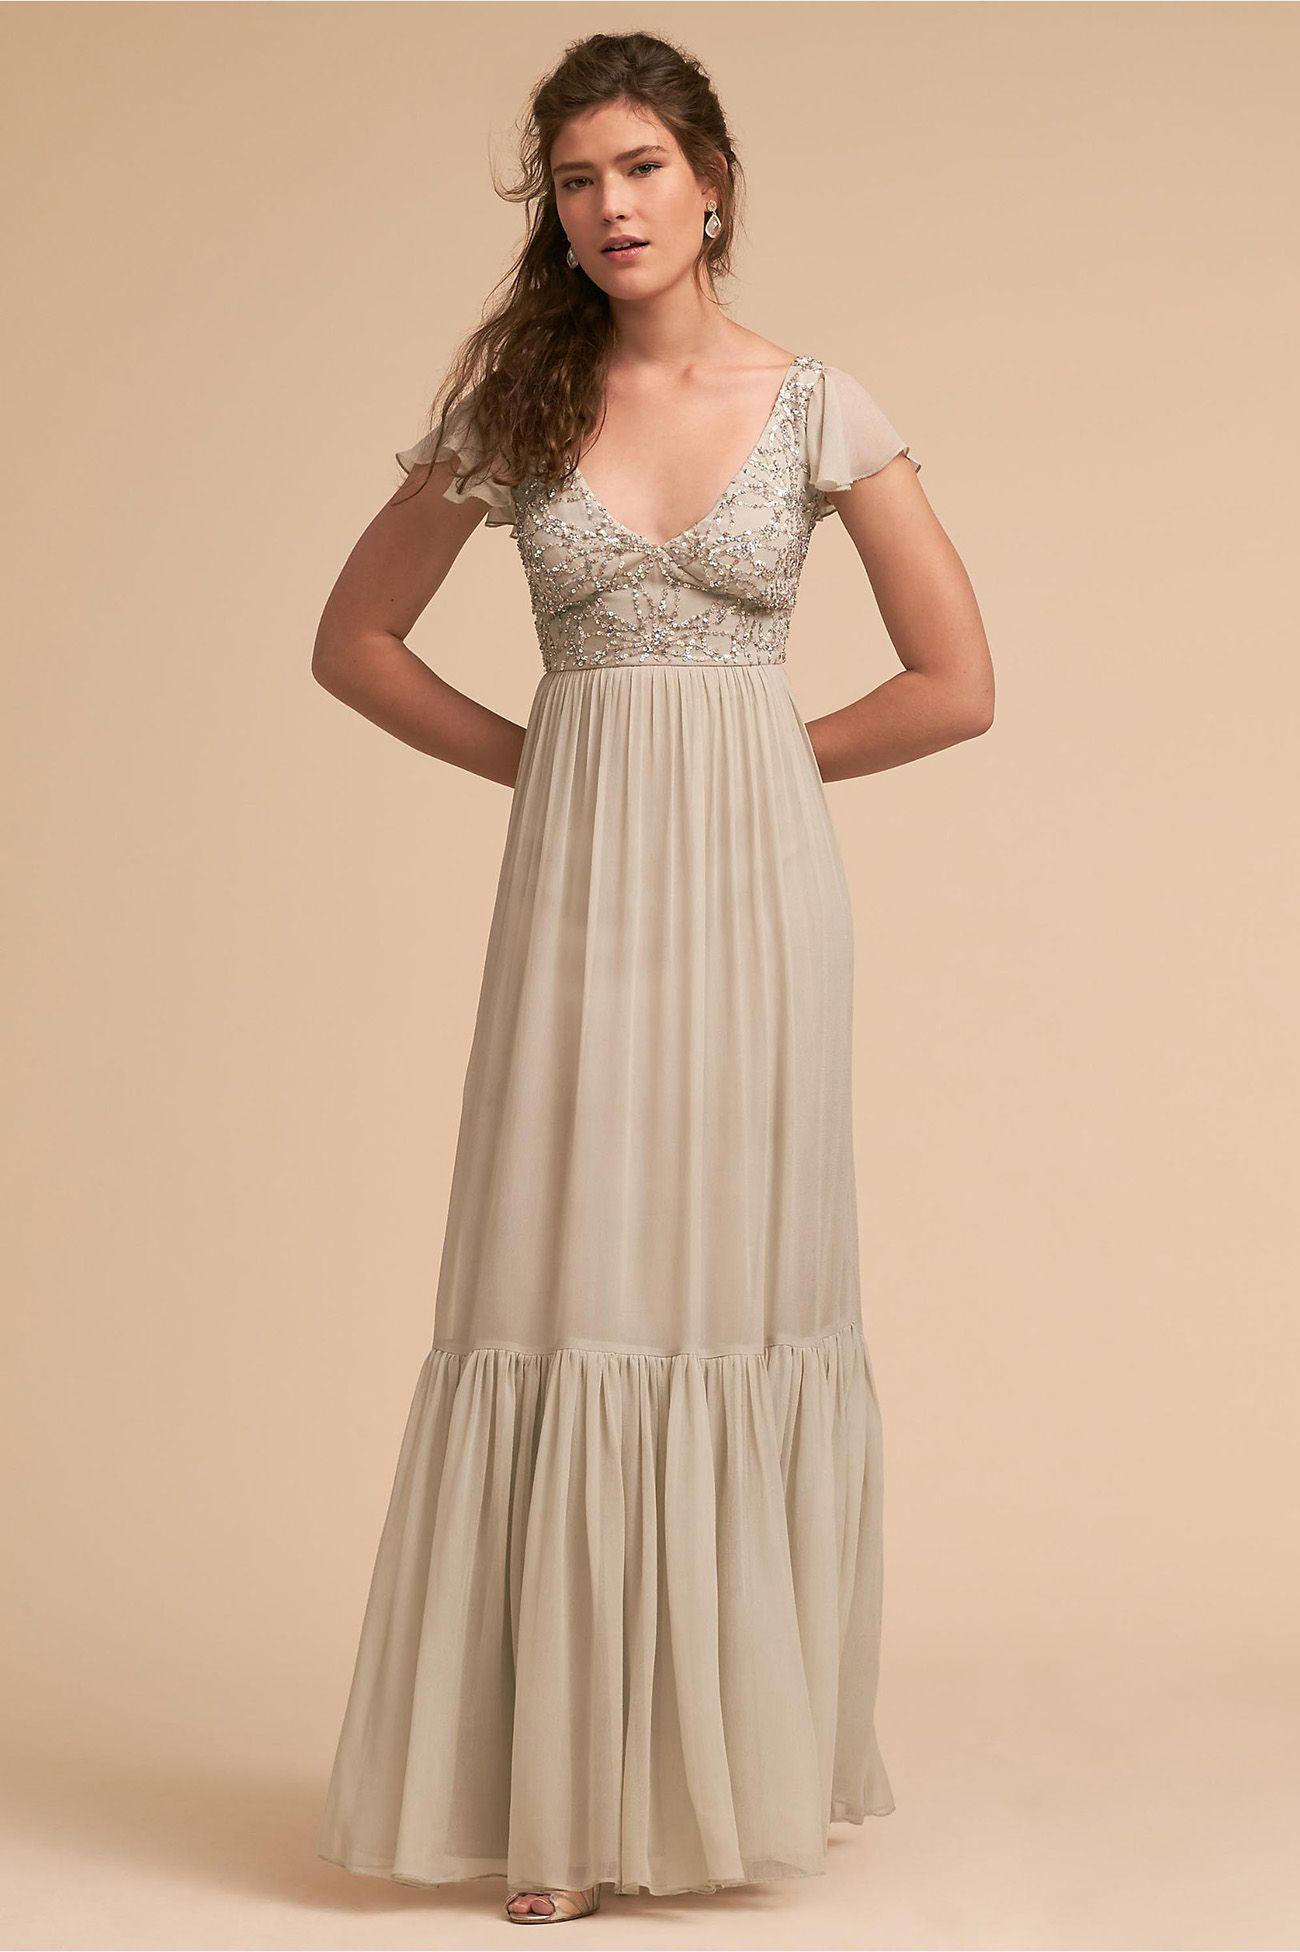 Our Favorite Wedding Dresses Under $500 | Green weddings, Wedding ...